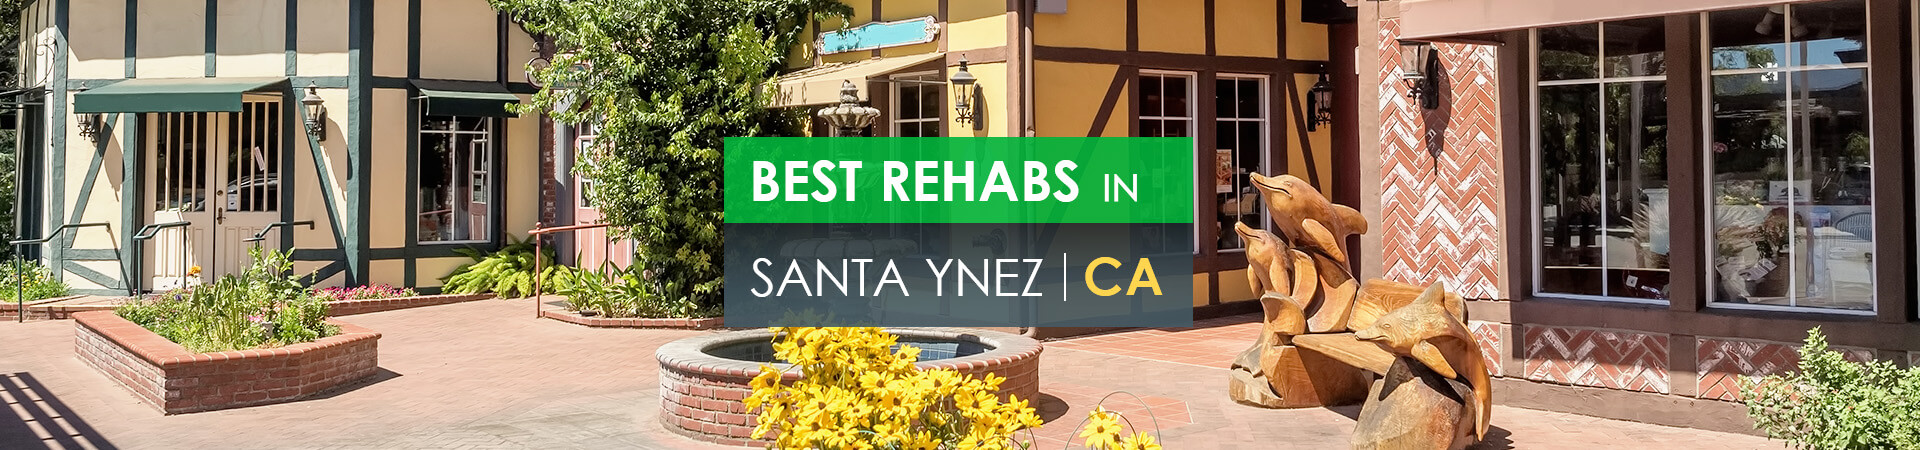 Best rehabs in Santa Ynez, Ca